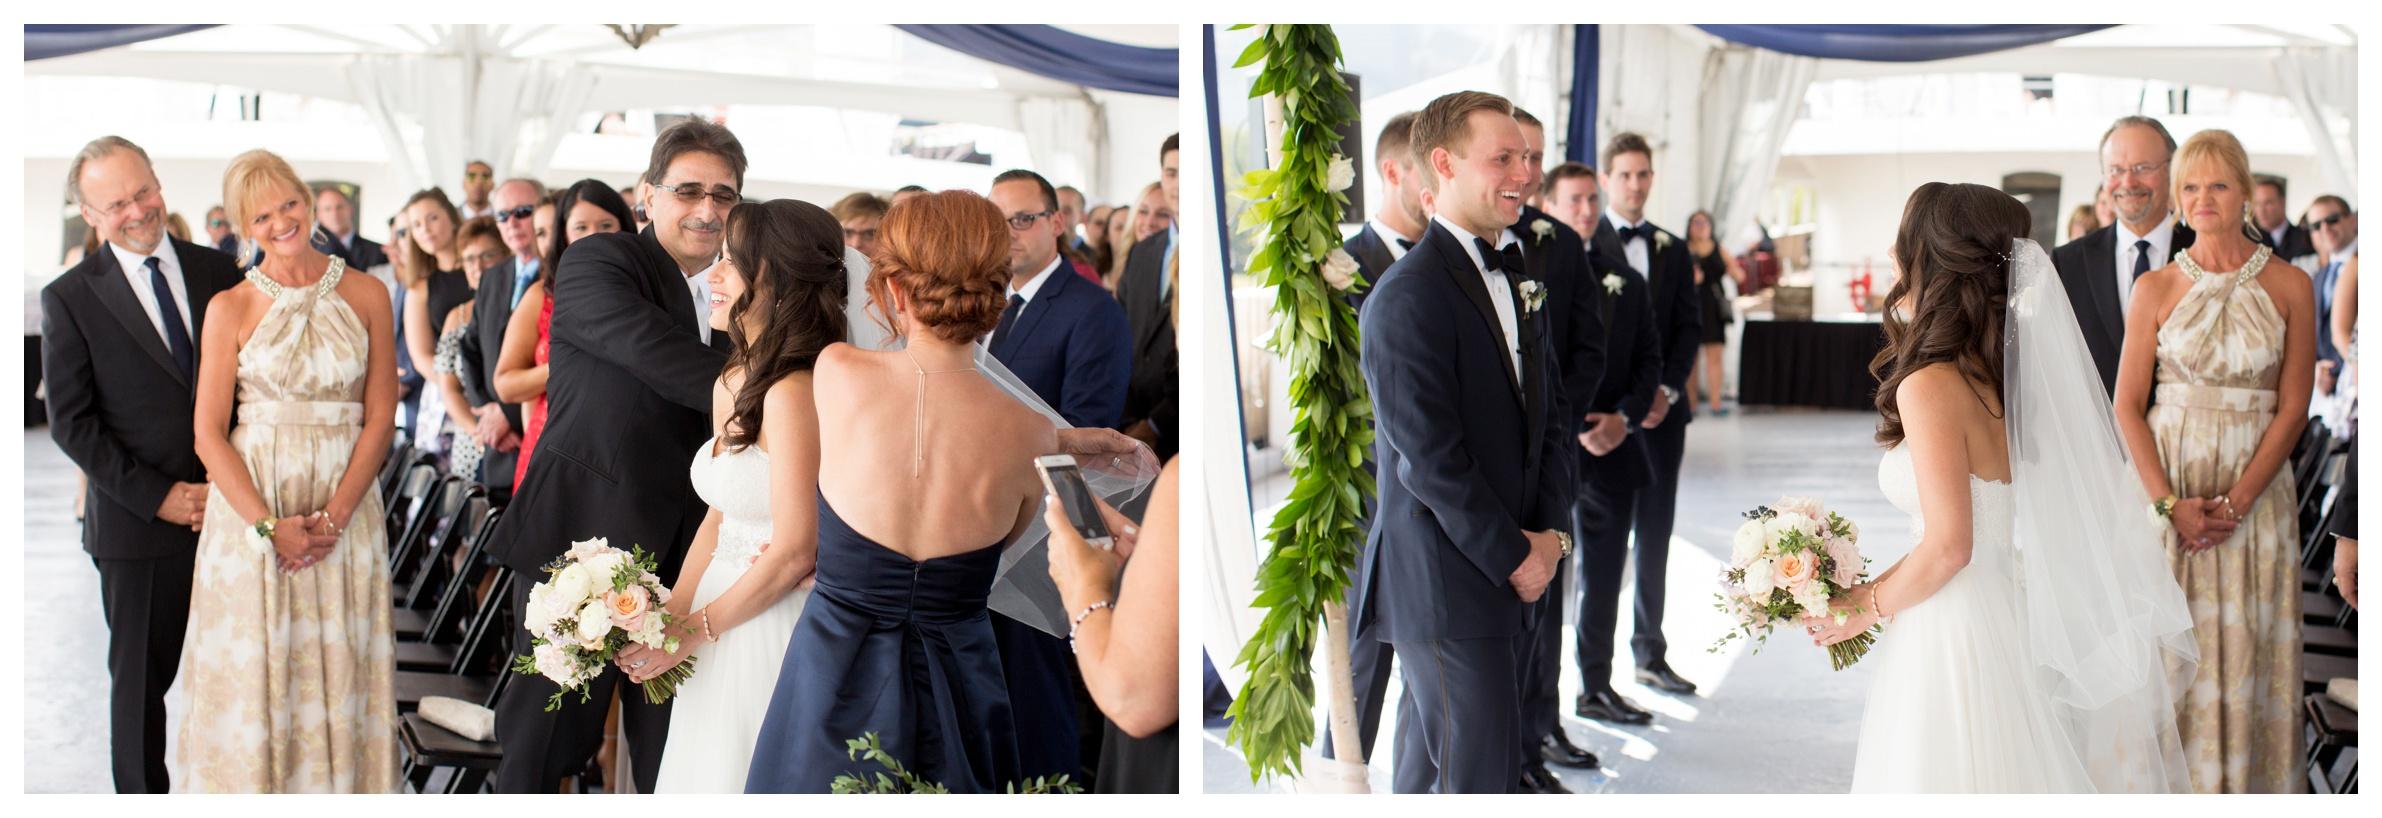 columbia-yacht-club-chicago-wedding_0018.jpg